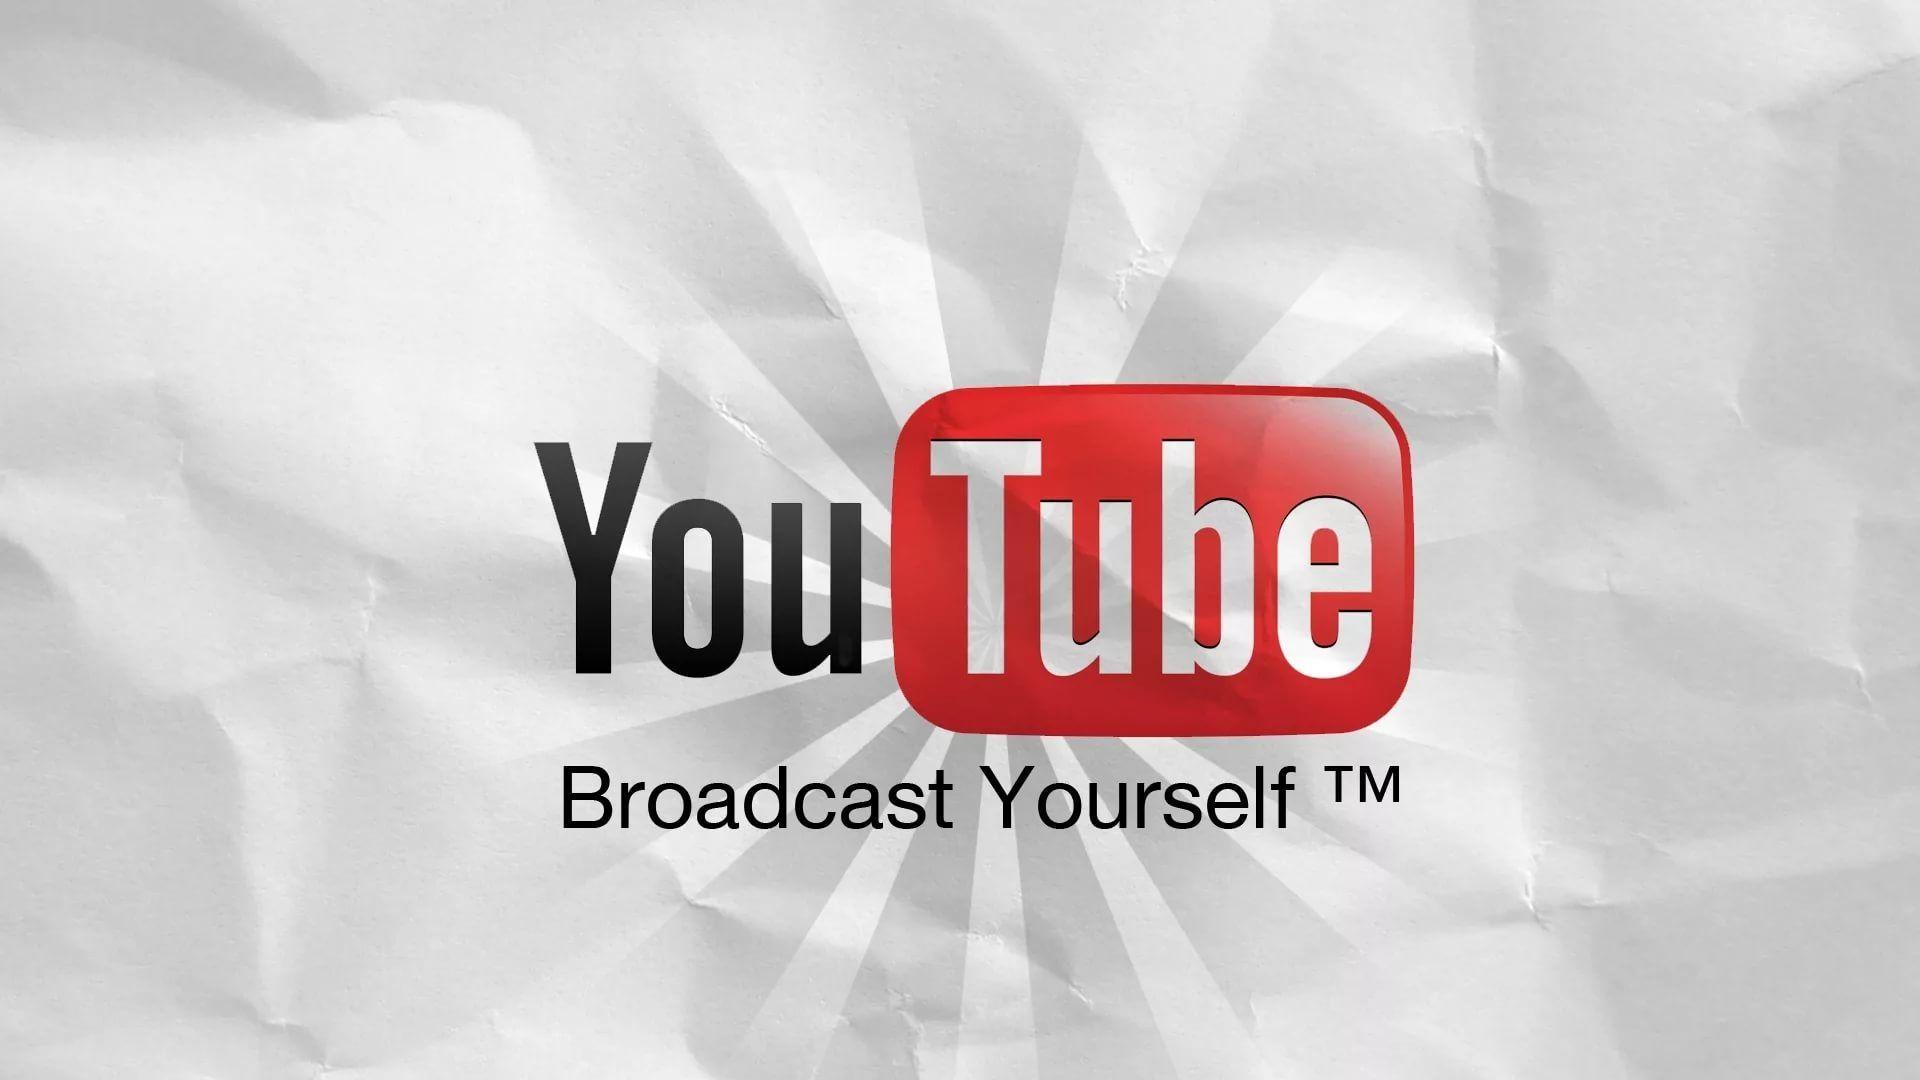 Youtube PC Wallpaper HD